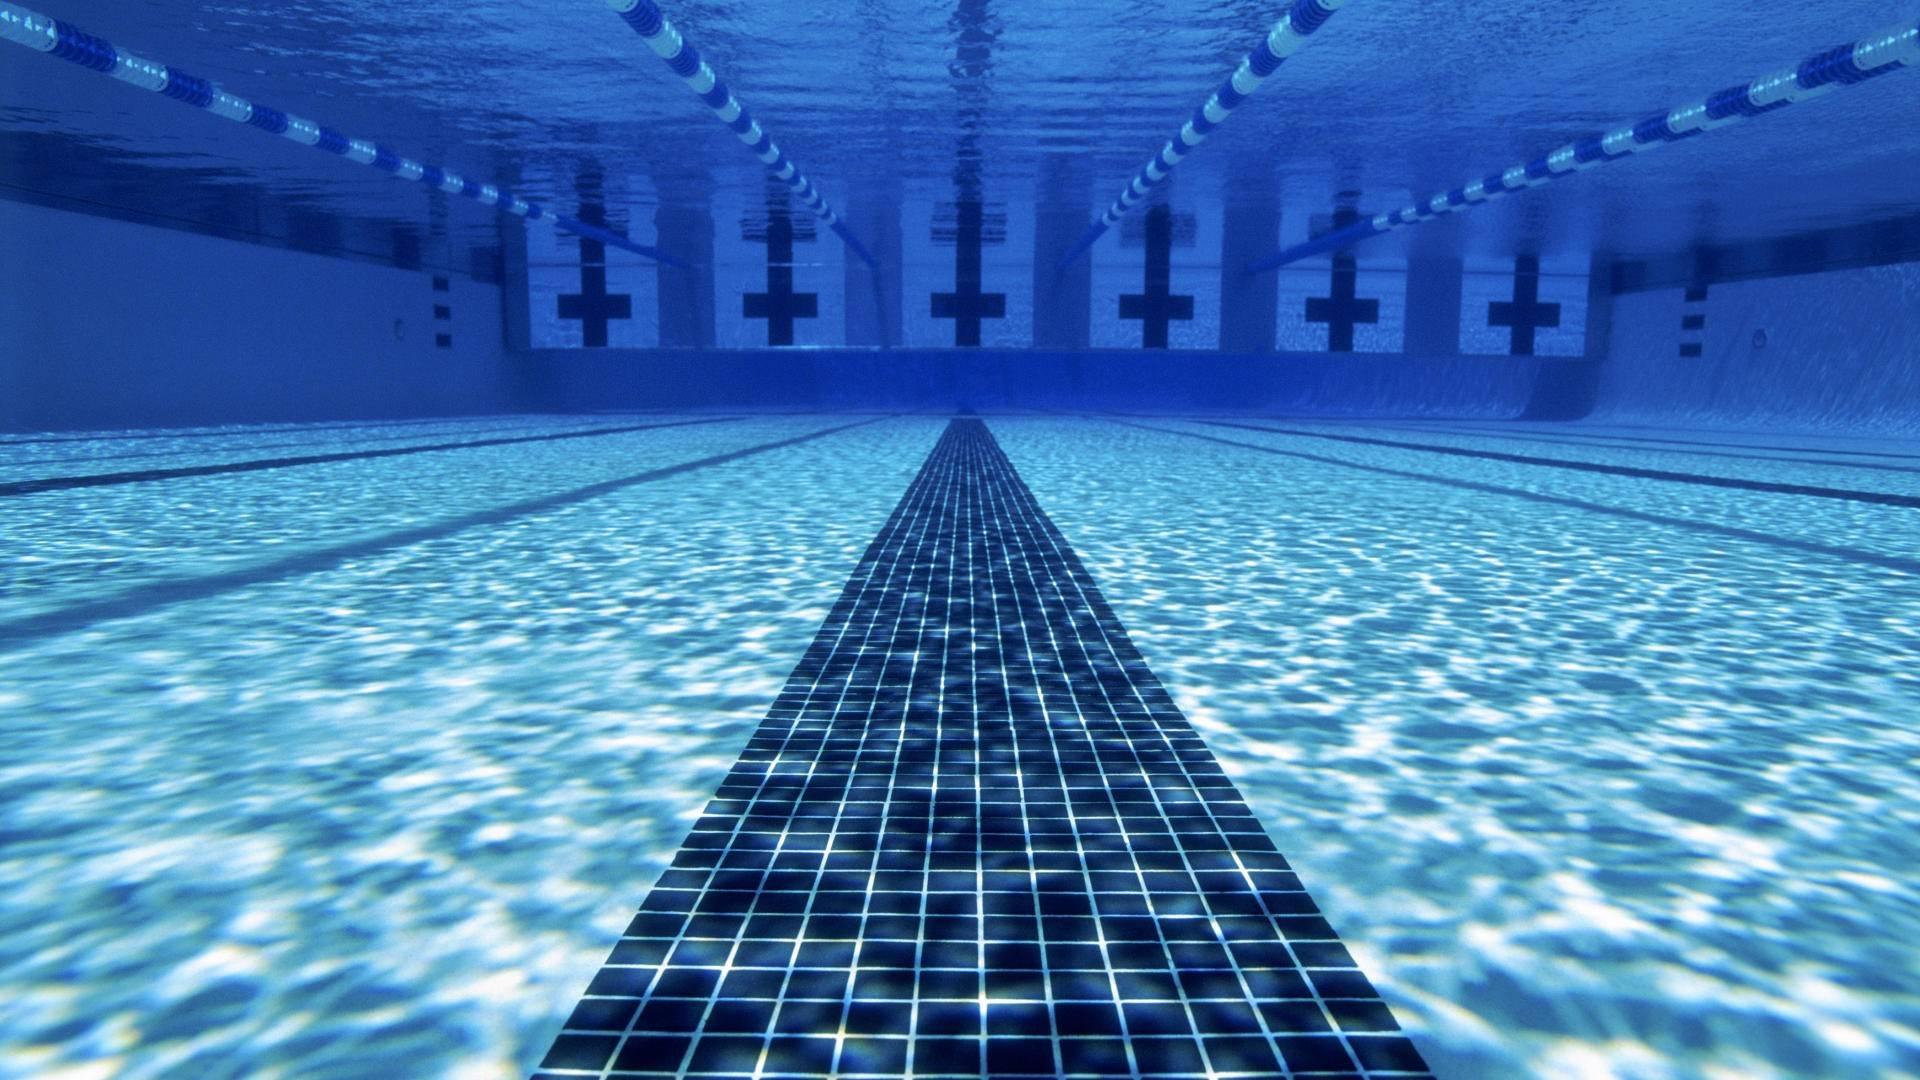 Swimming Pool Wallpapers  Wallpaper Cave